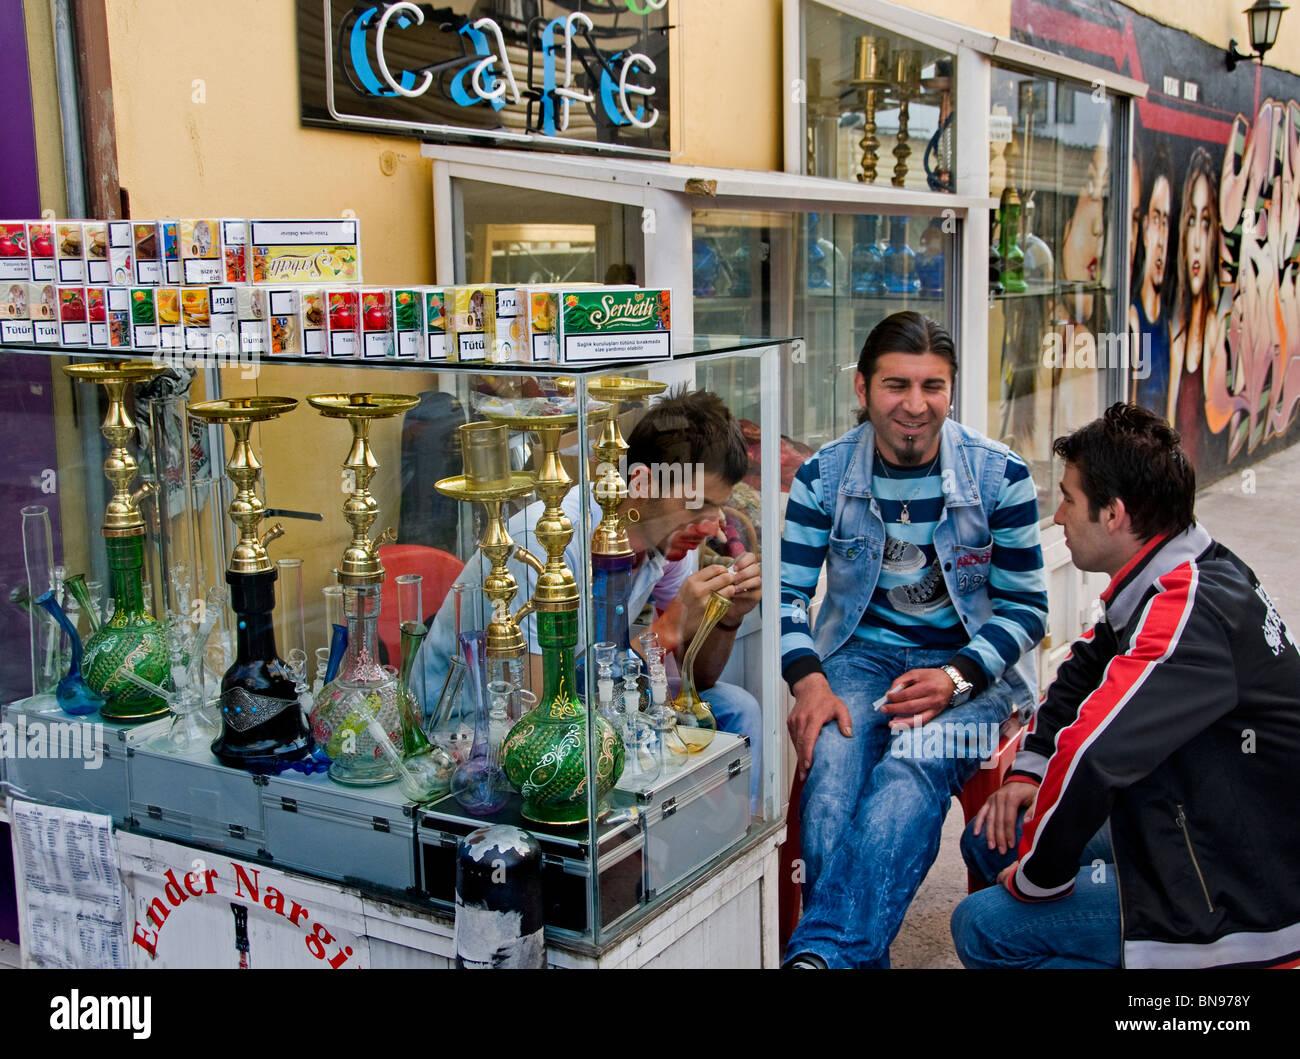 Turchia Istanbul fumatori tubazione acqua cancro ai polmoni Immagini Stock